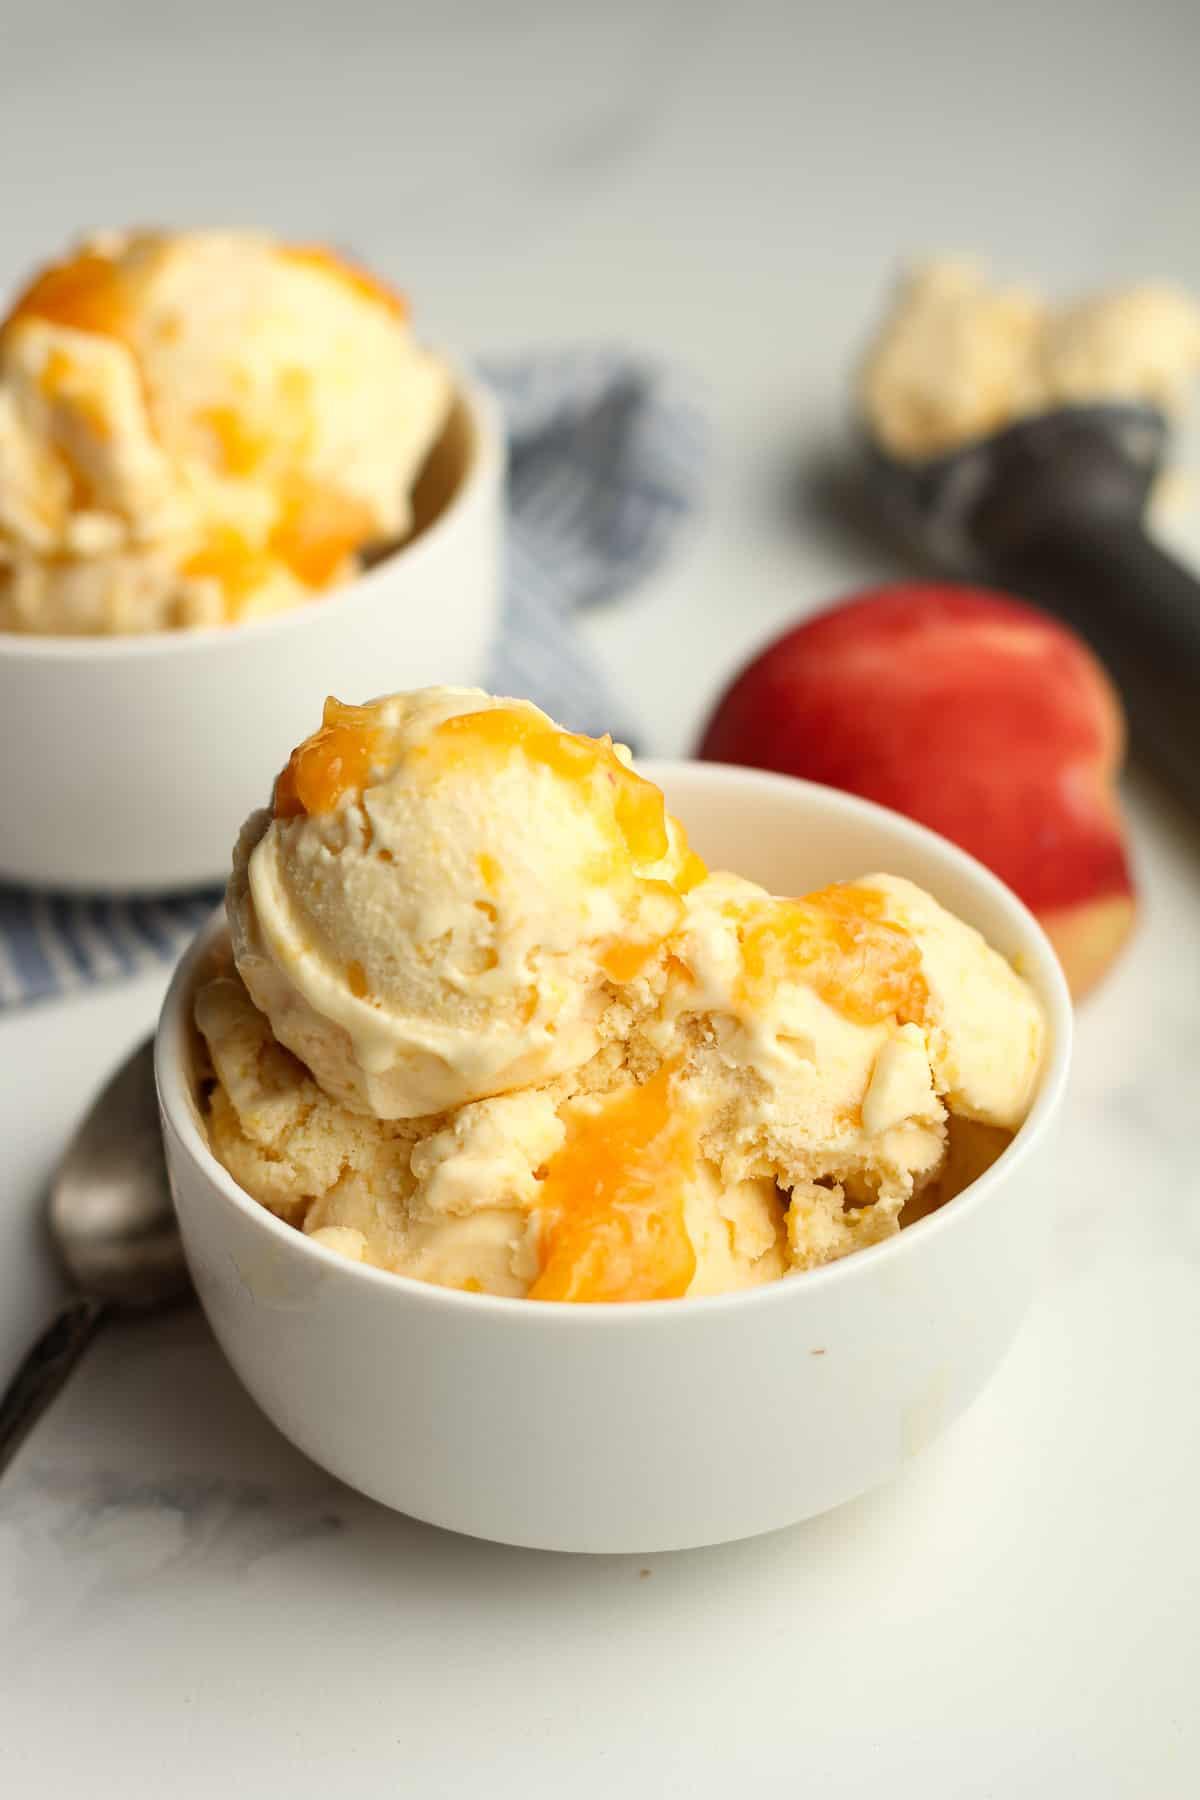 Closeup on a bowl of peach ice cream.